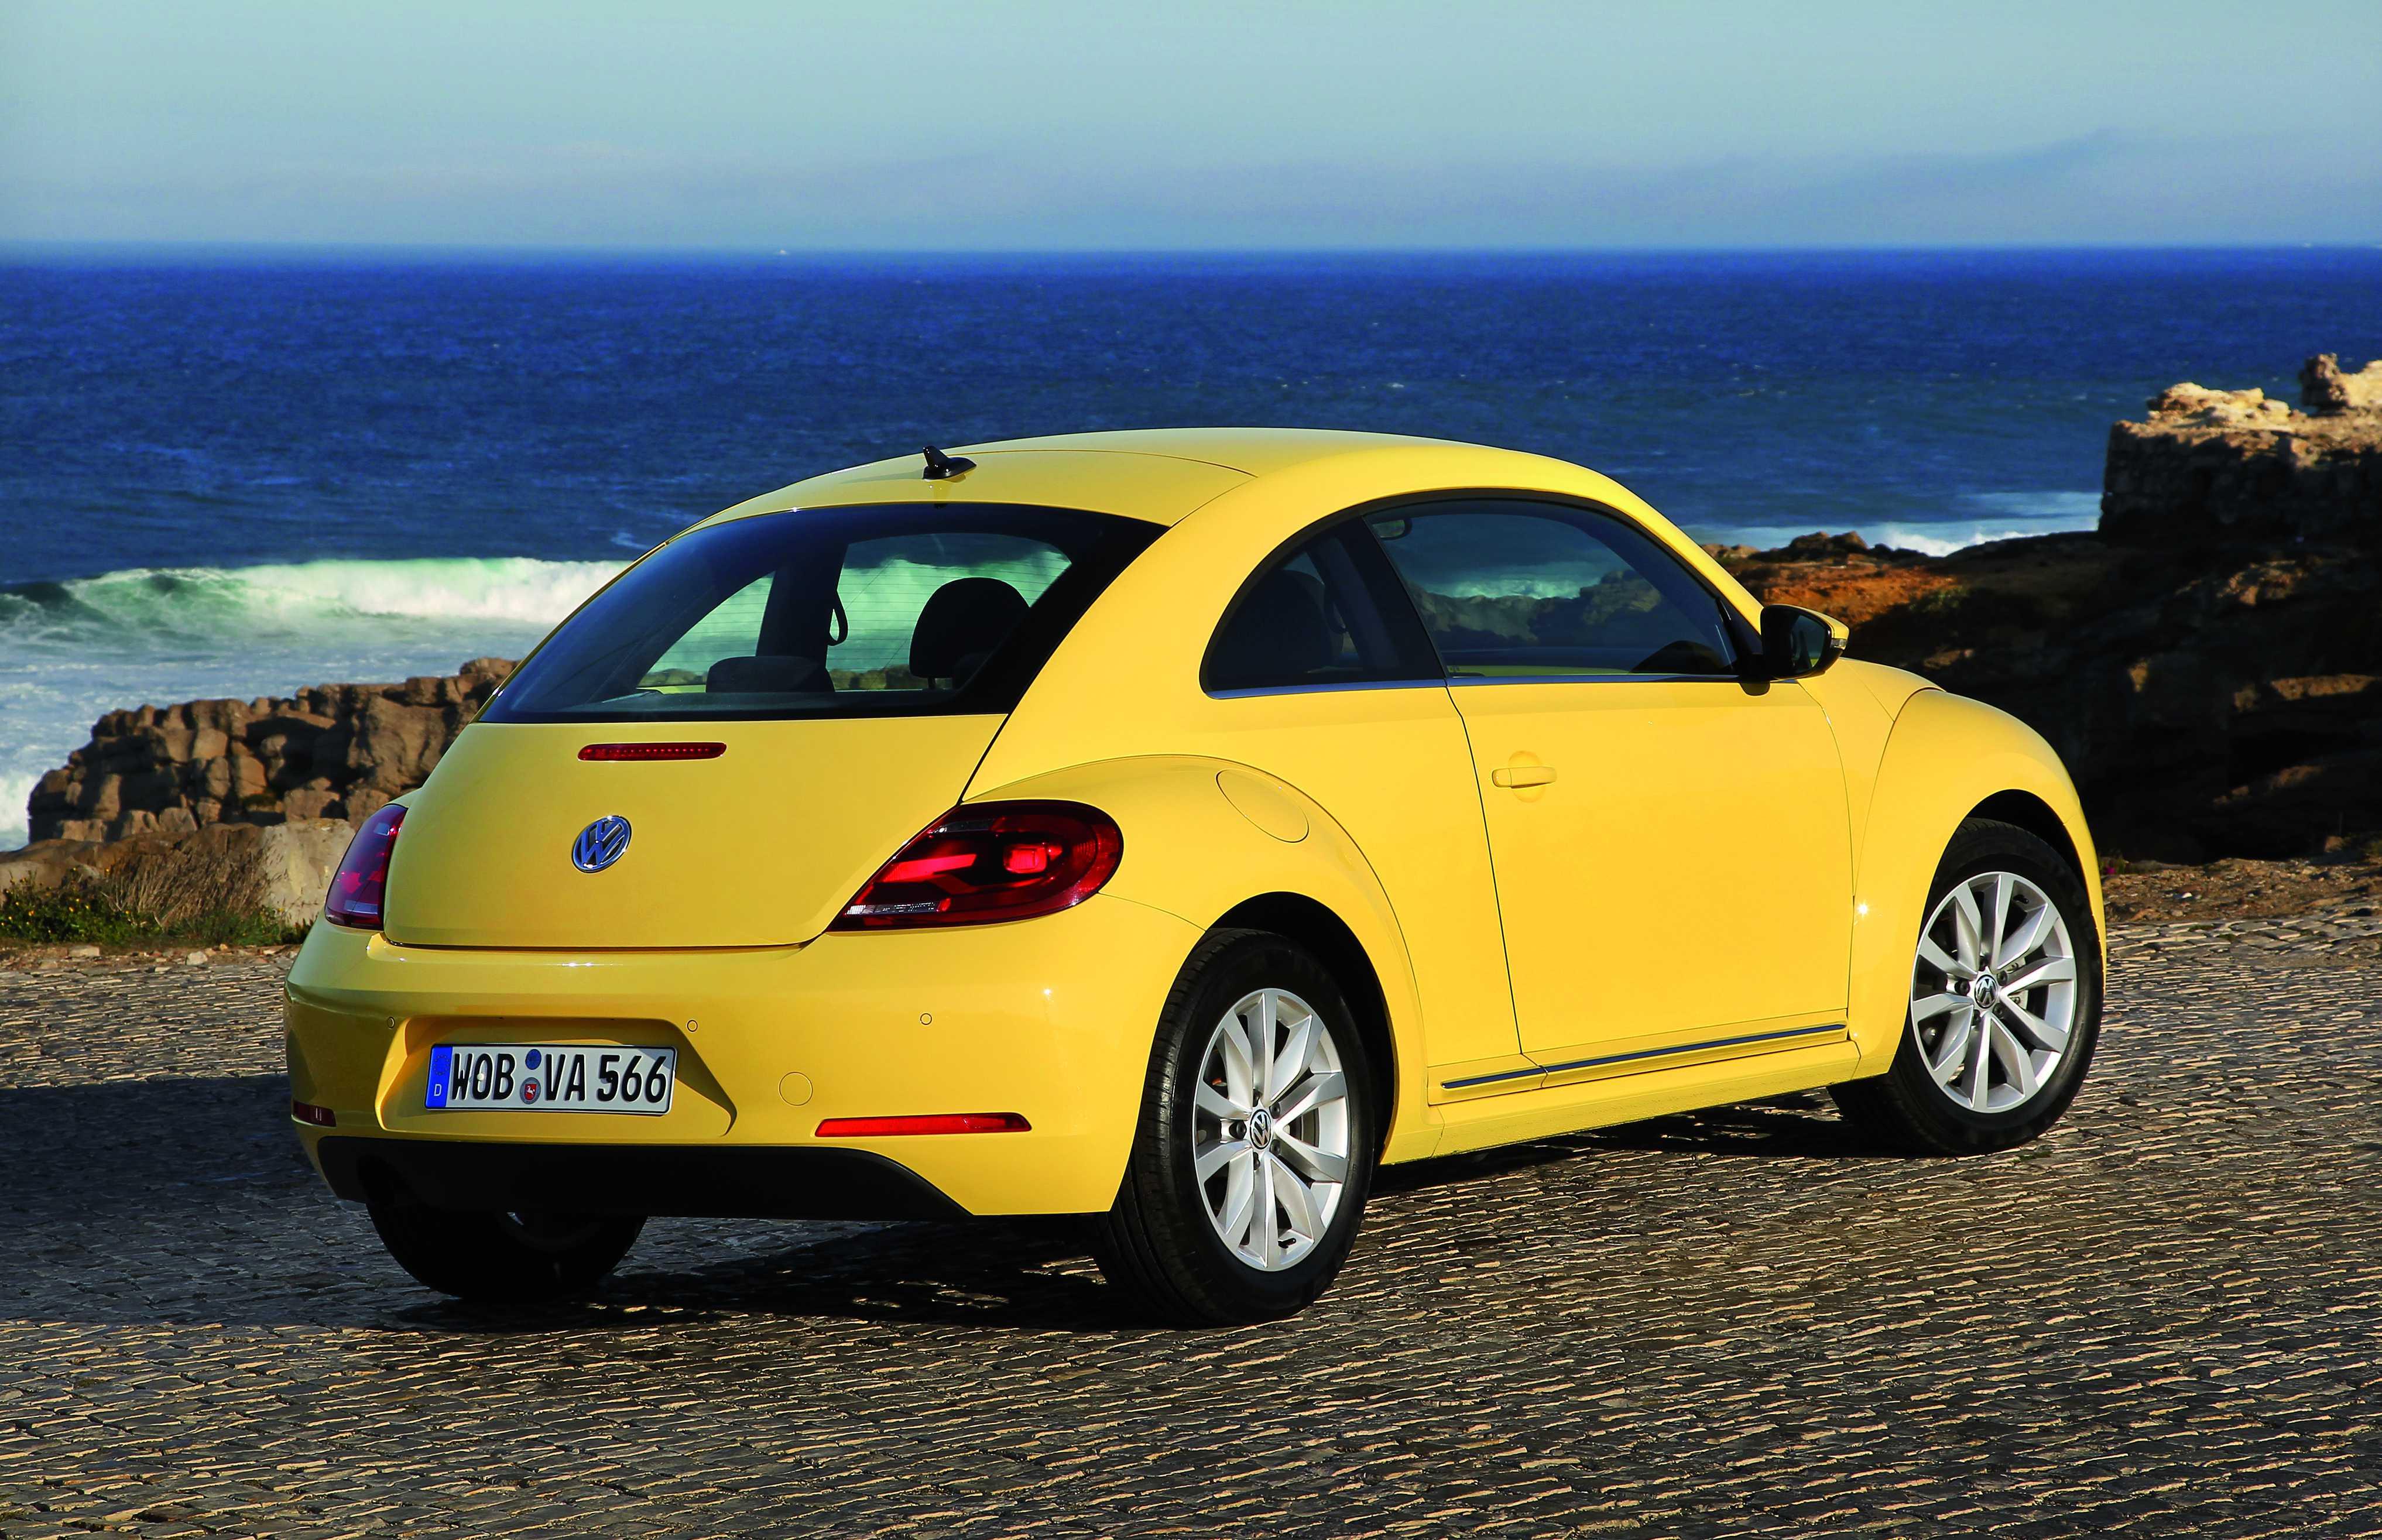 sale convertible for vehicle new beetle lethbridge volkswagen price inventory en coast